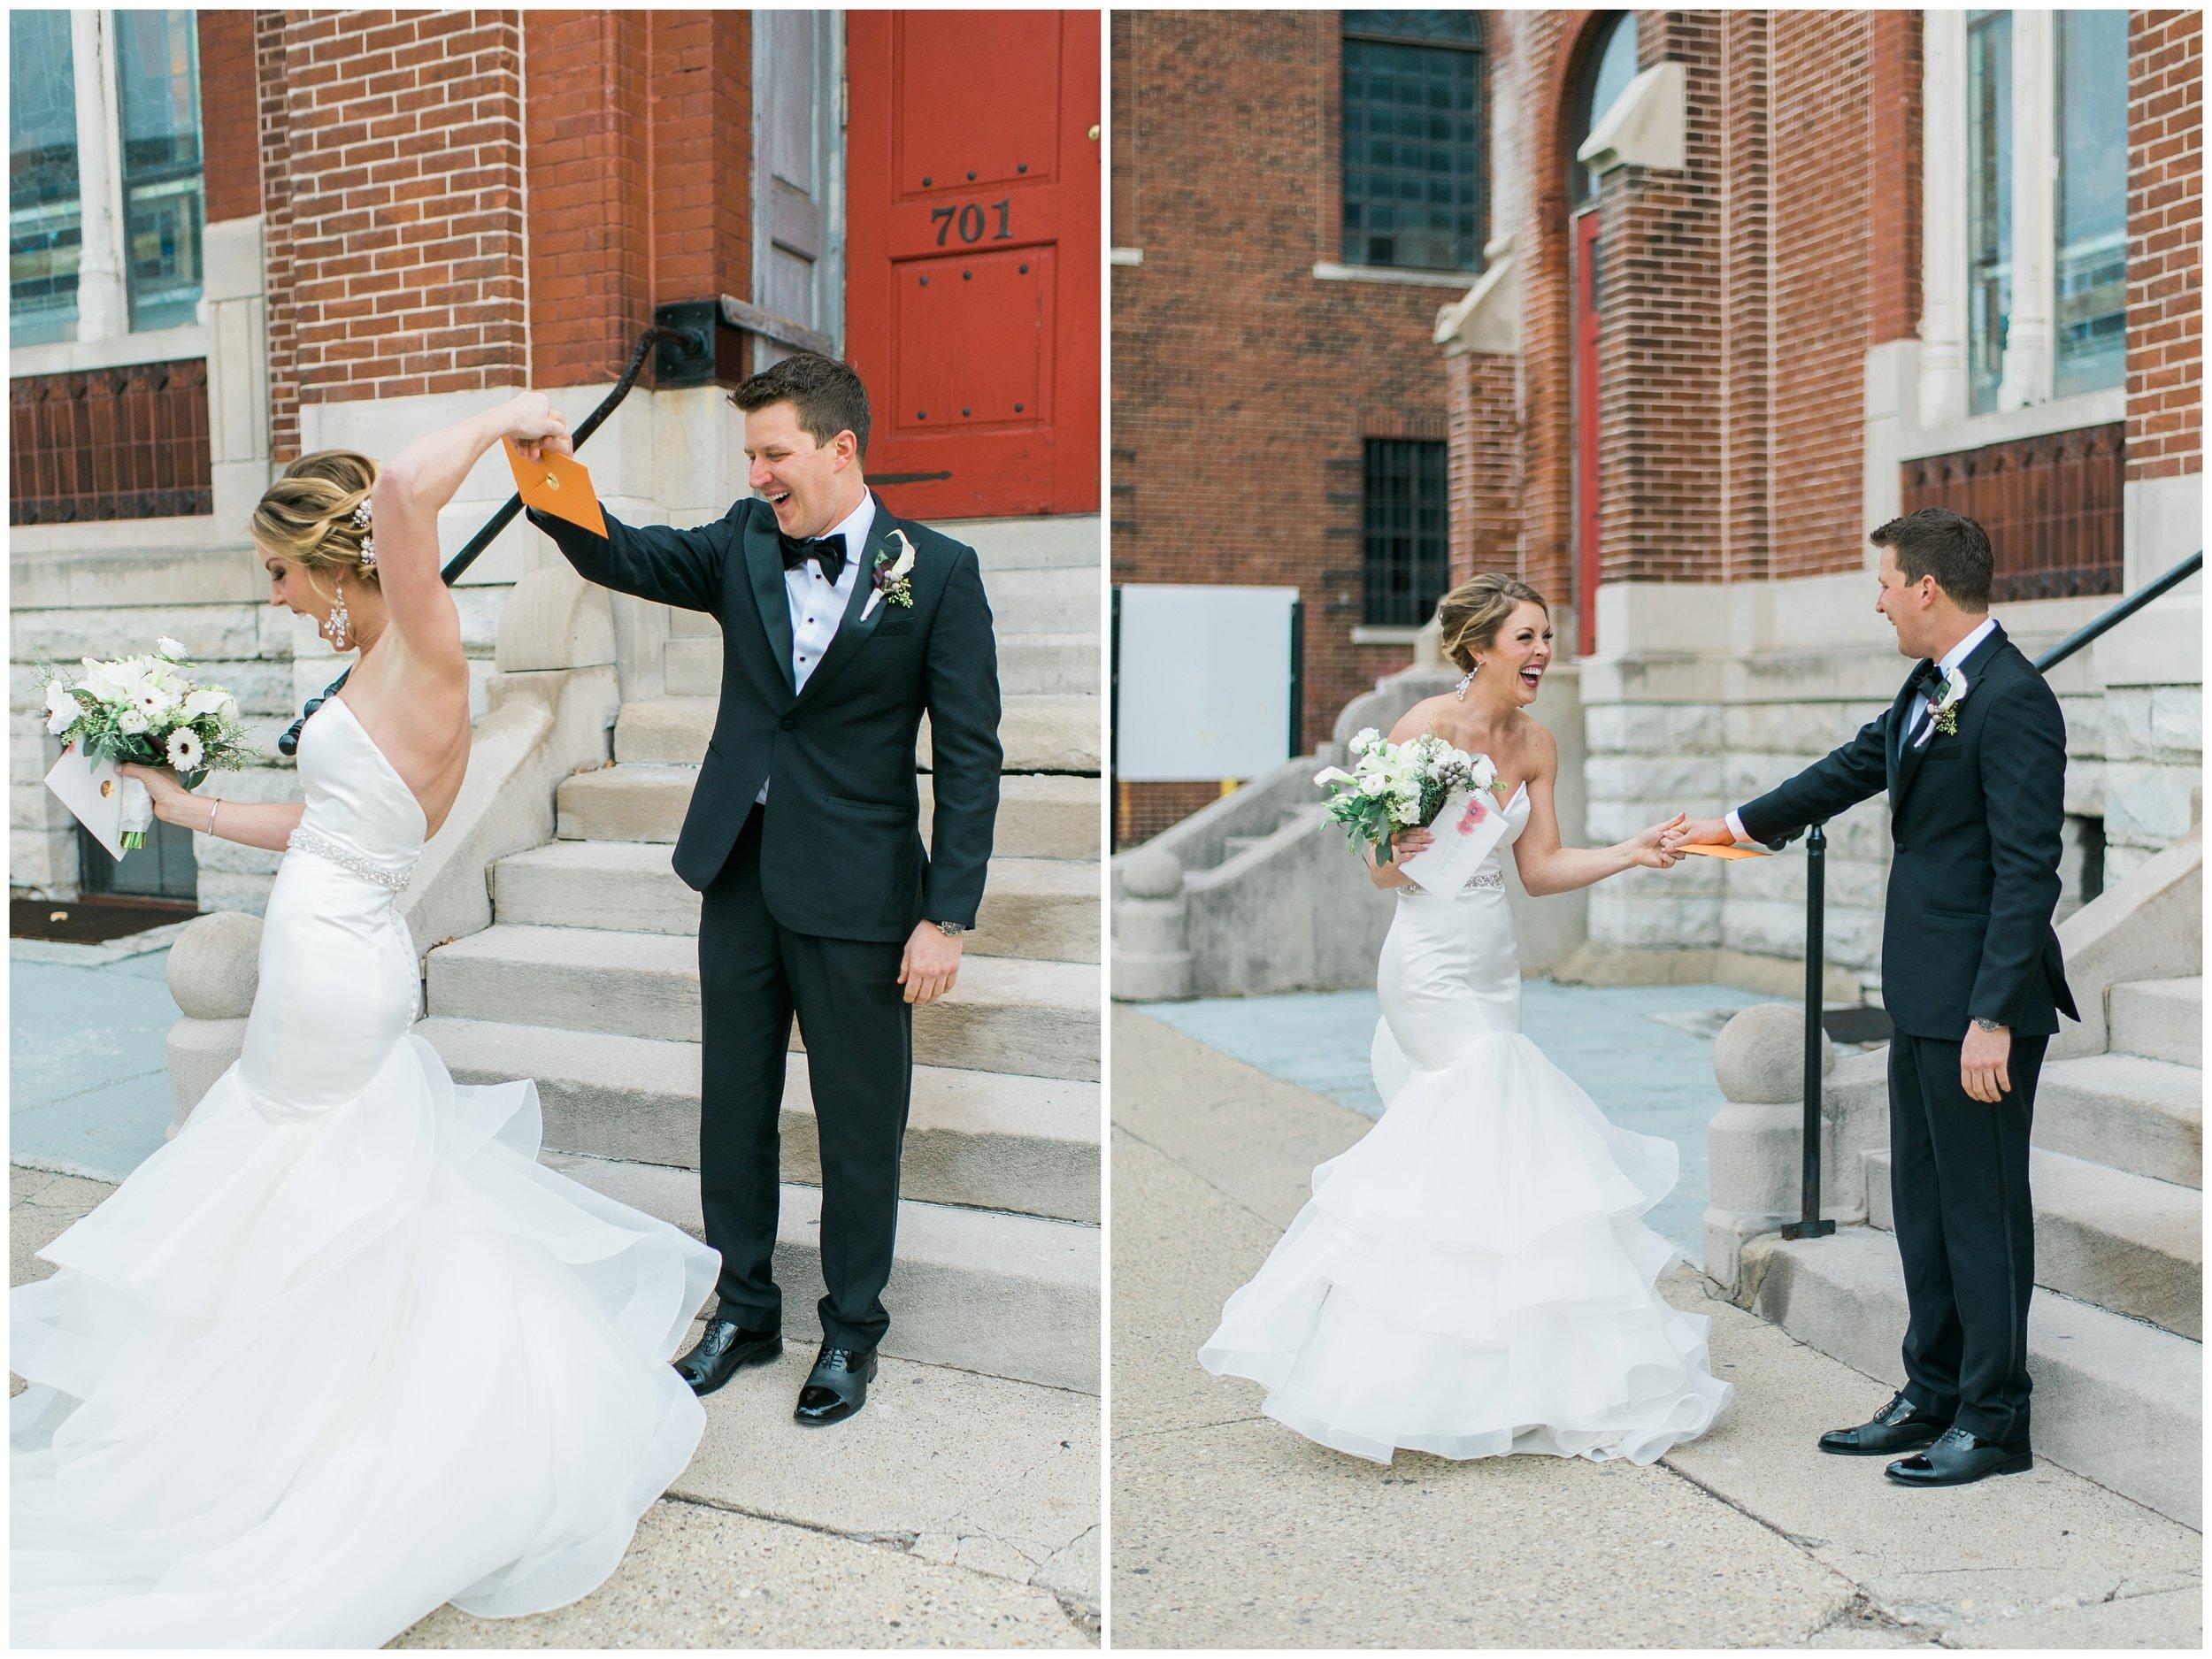 Rebecca_Bridges_Photography_Indianapolis_Wedding_Photographer_5794.jpg